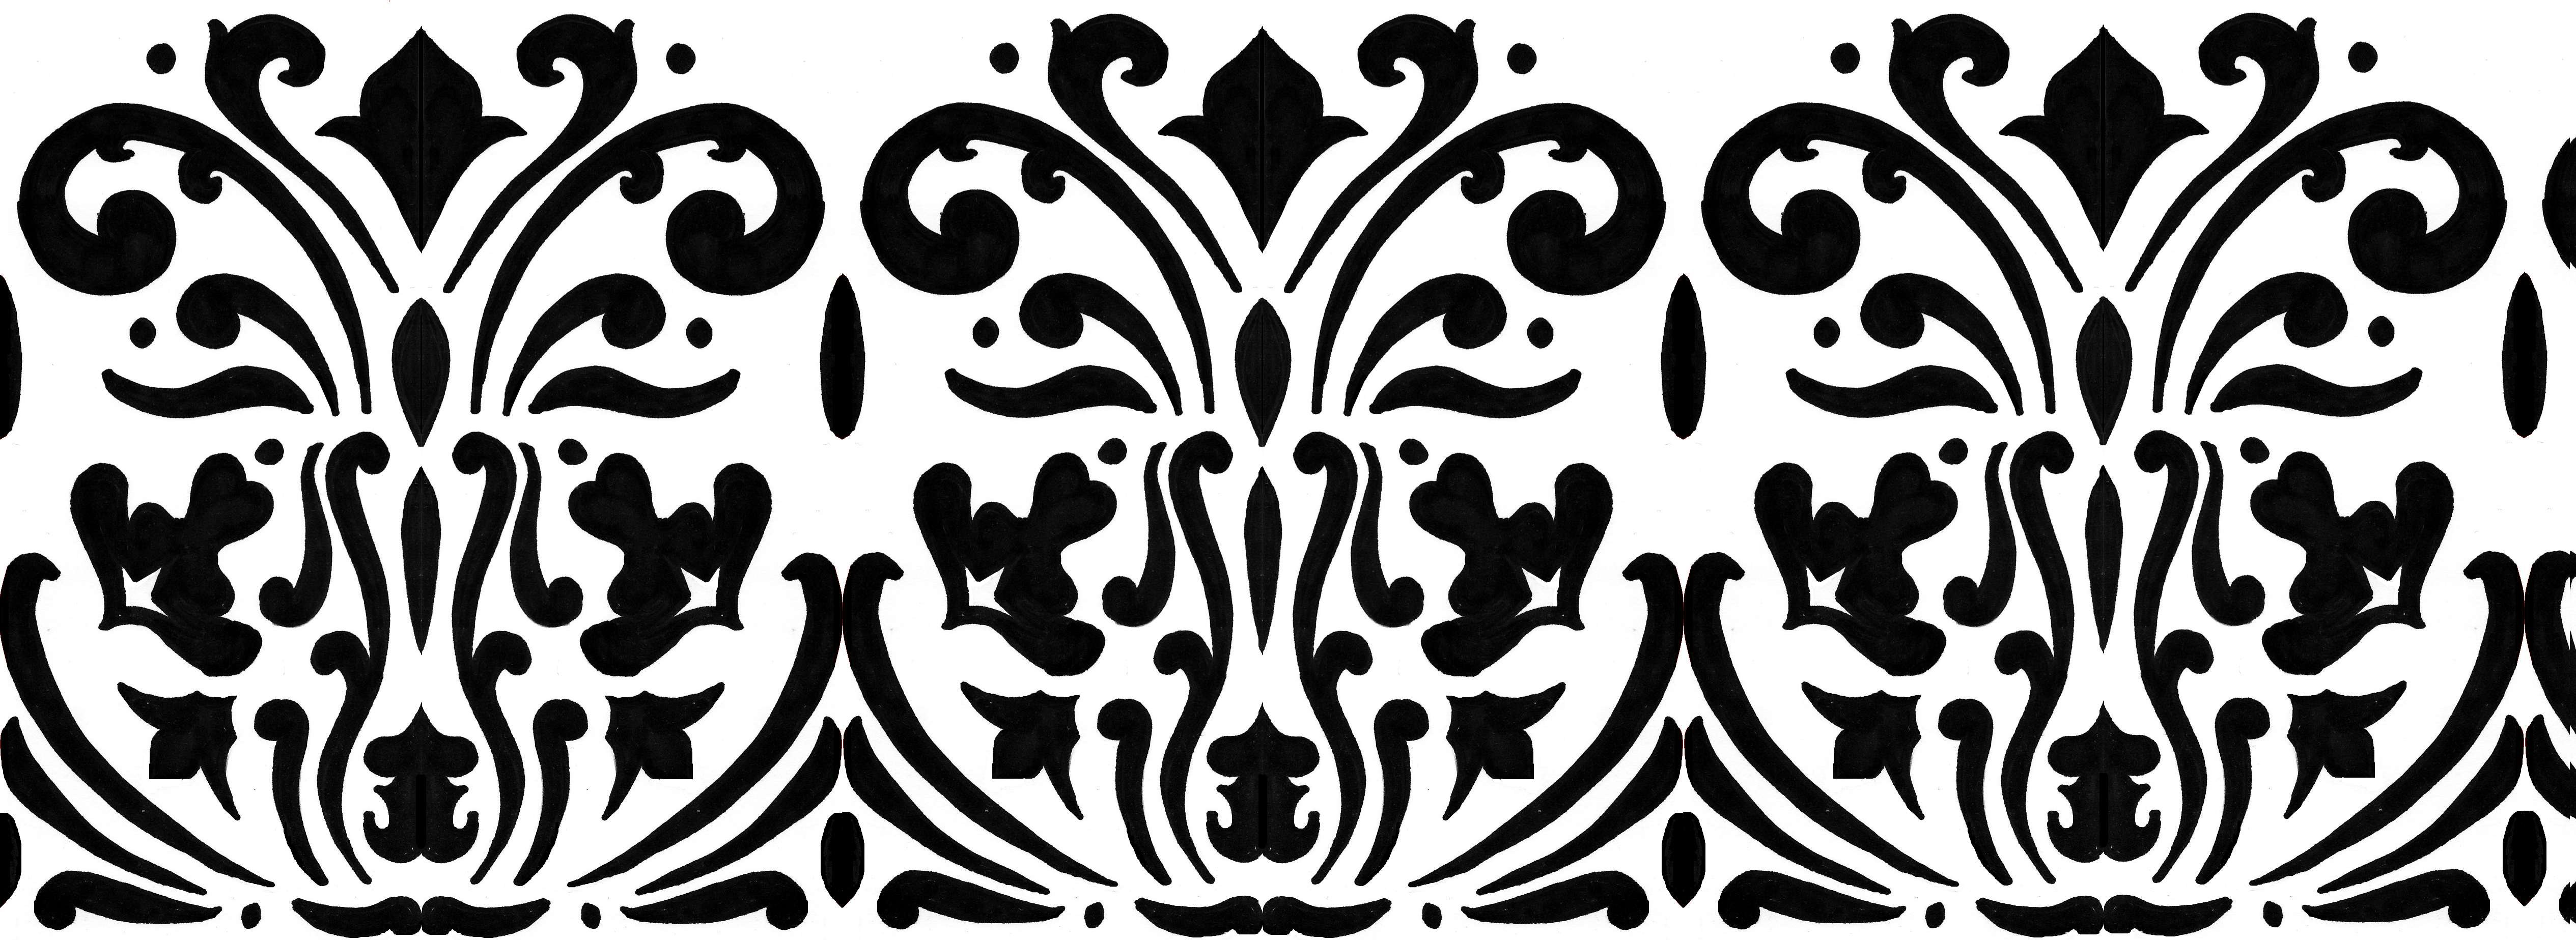 design free images at clker com vector clip art online royalty